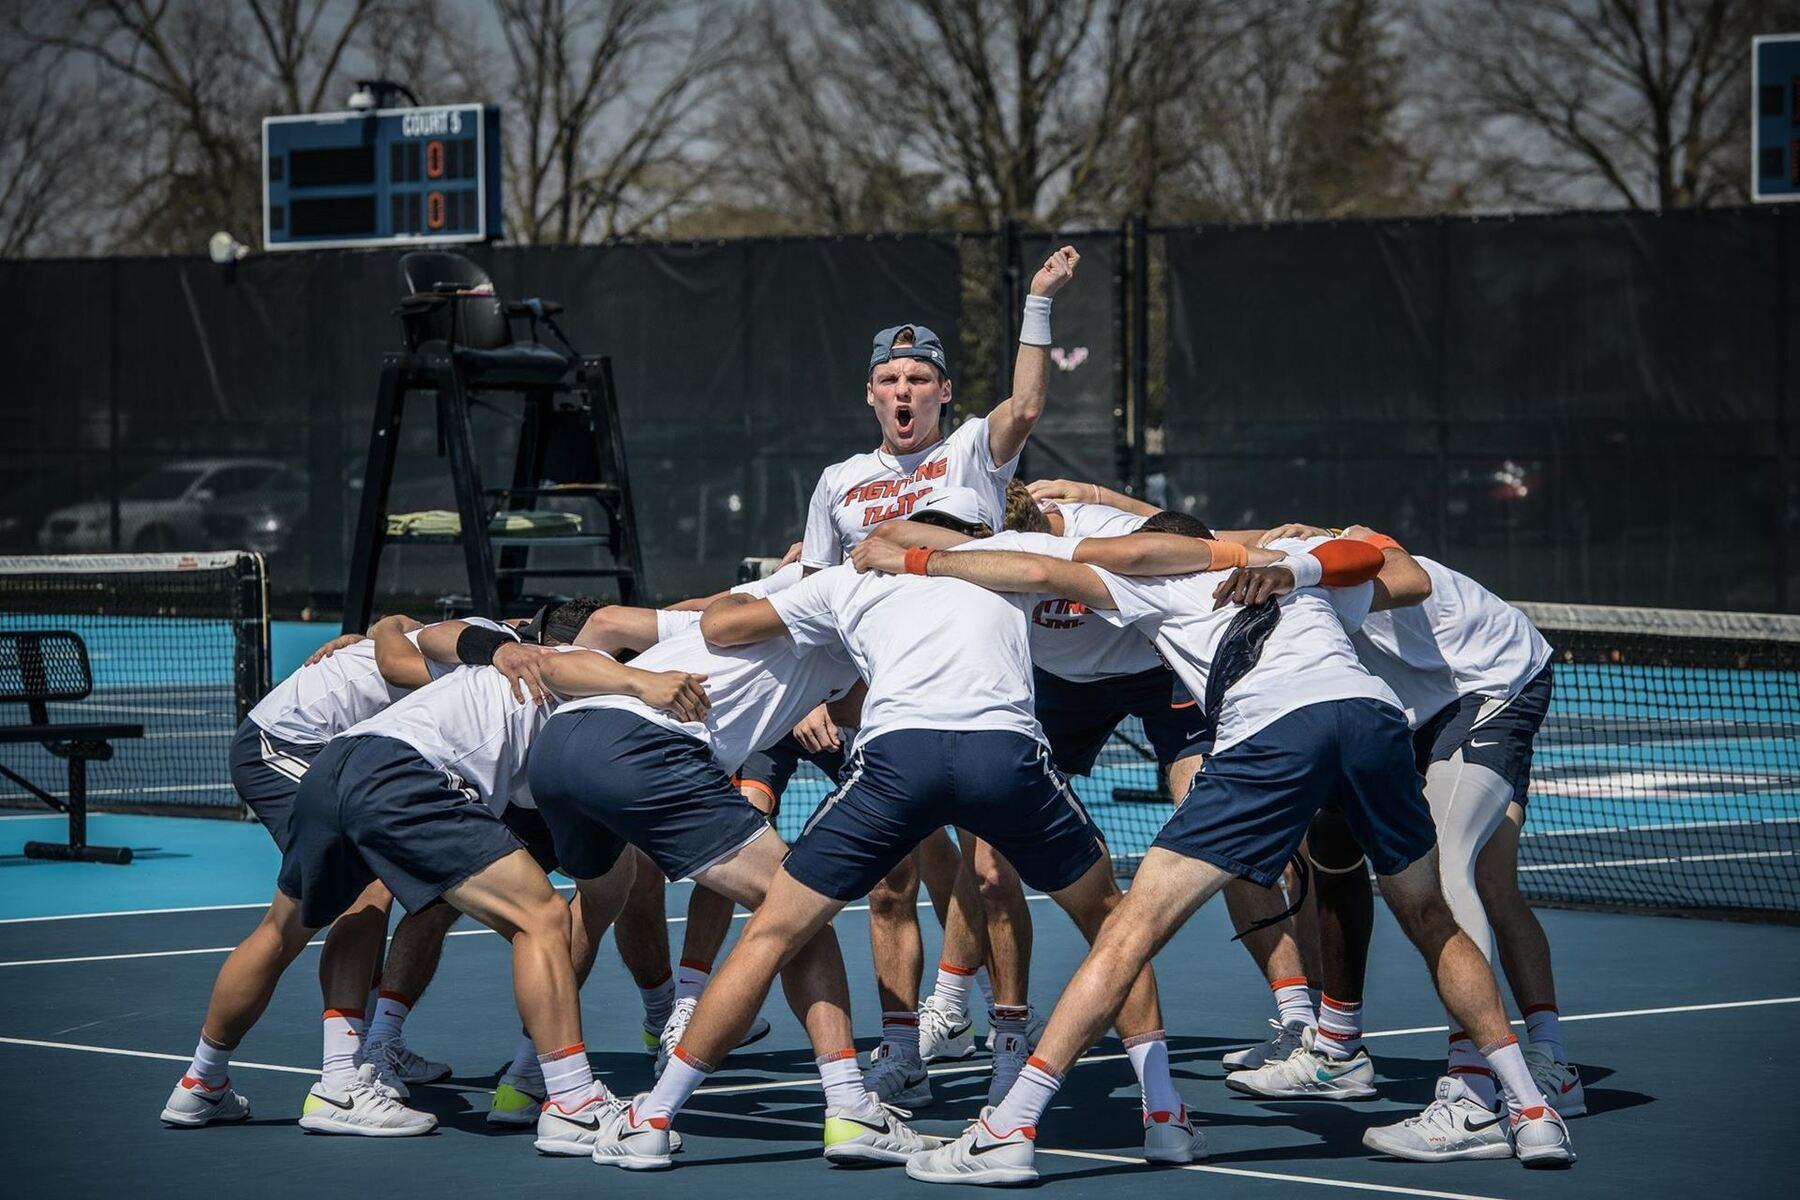 Men's tennis team huddles on court